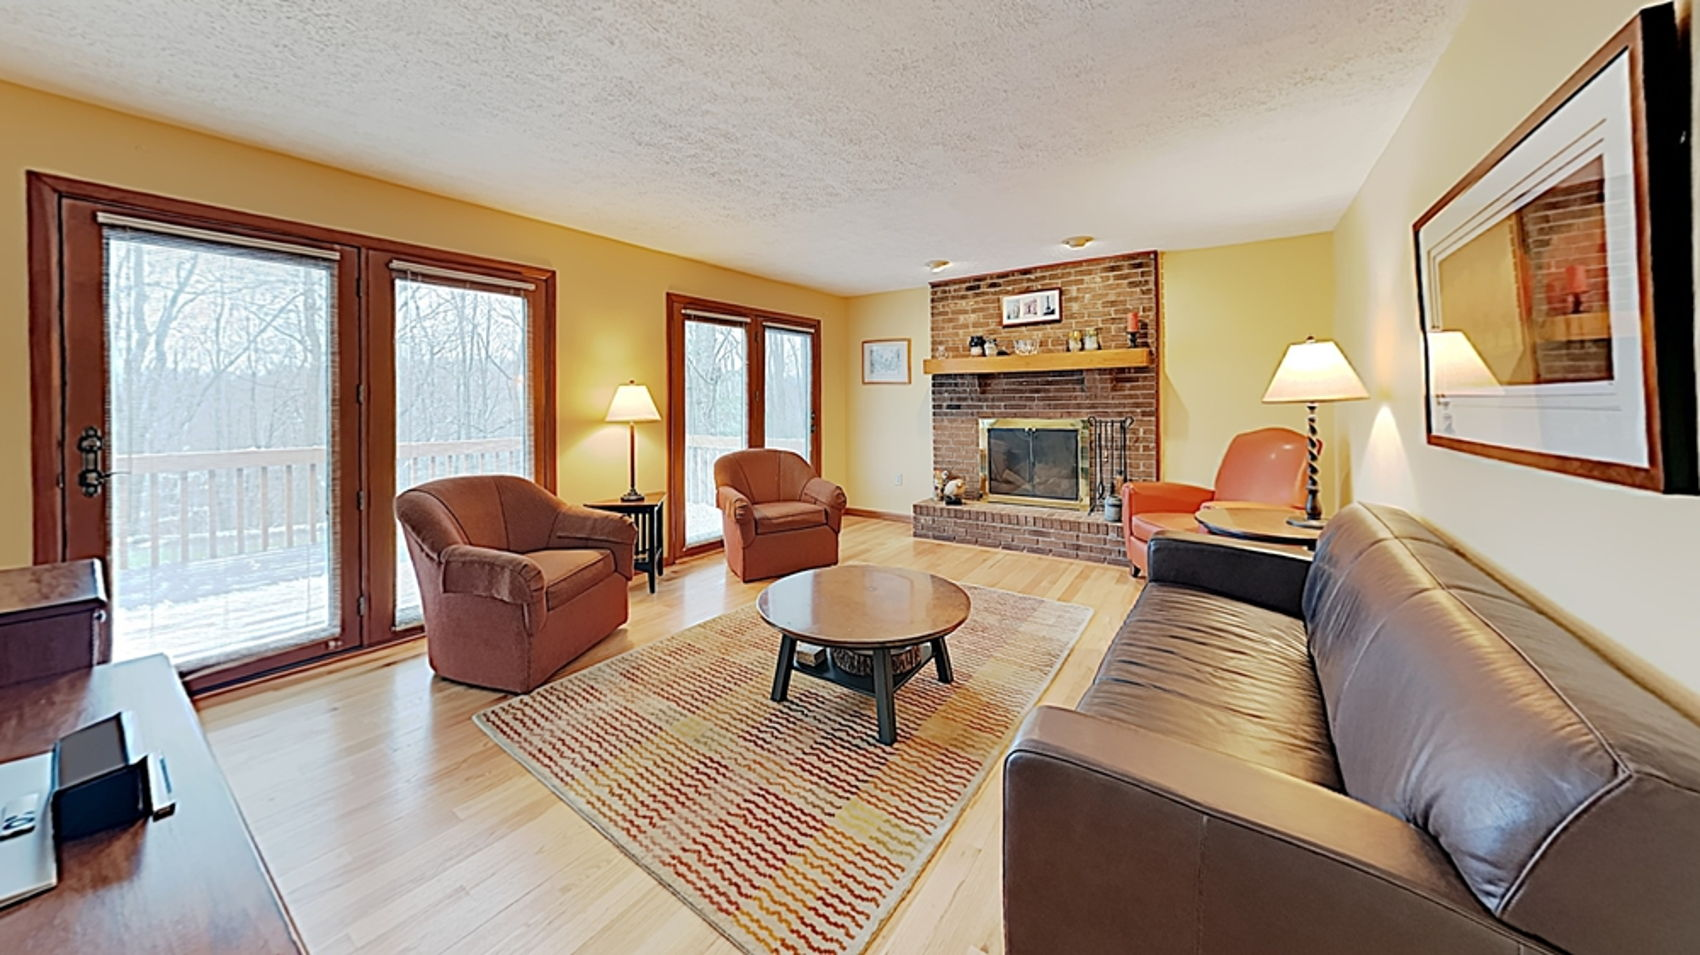 Family Room with hardwood flooring